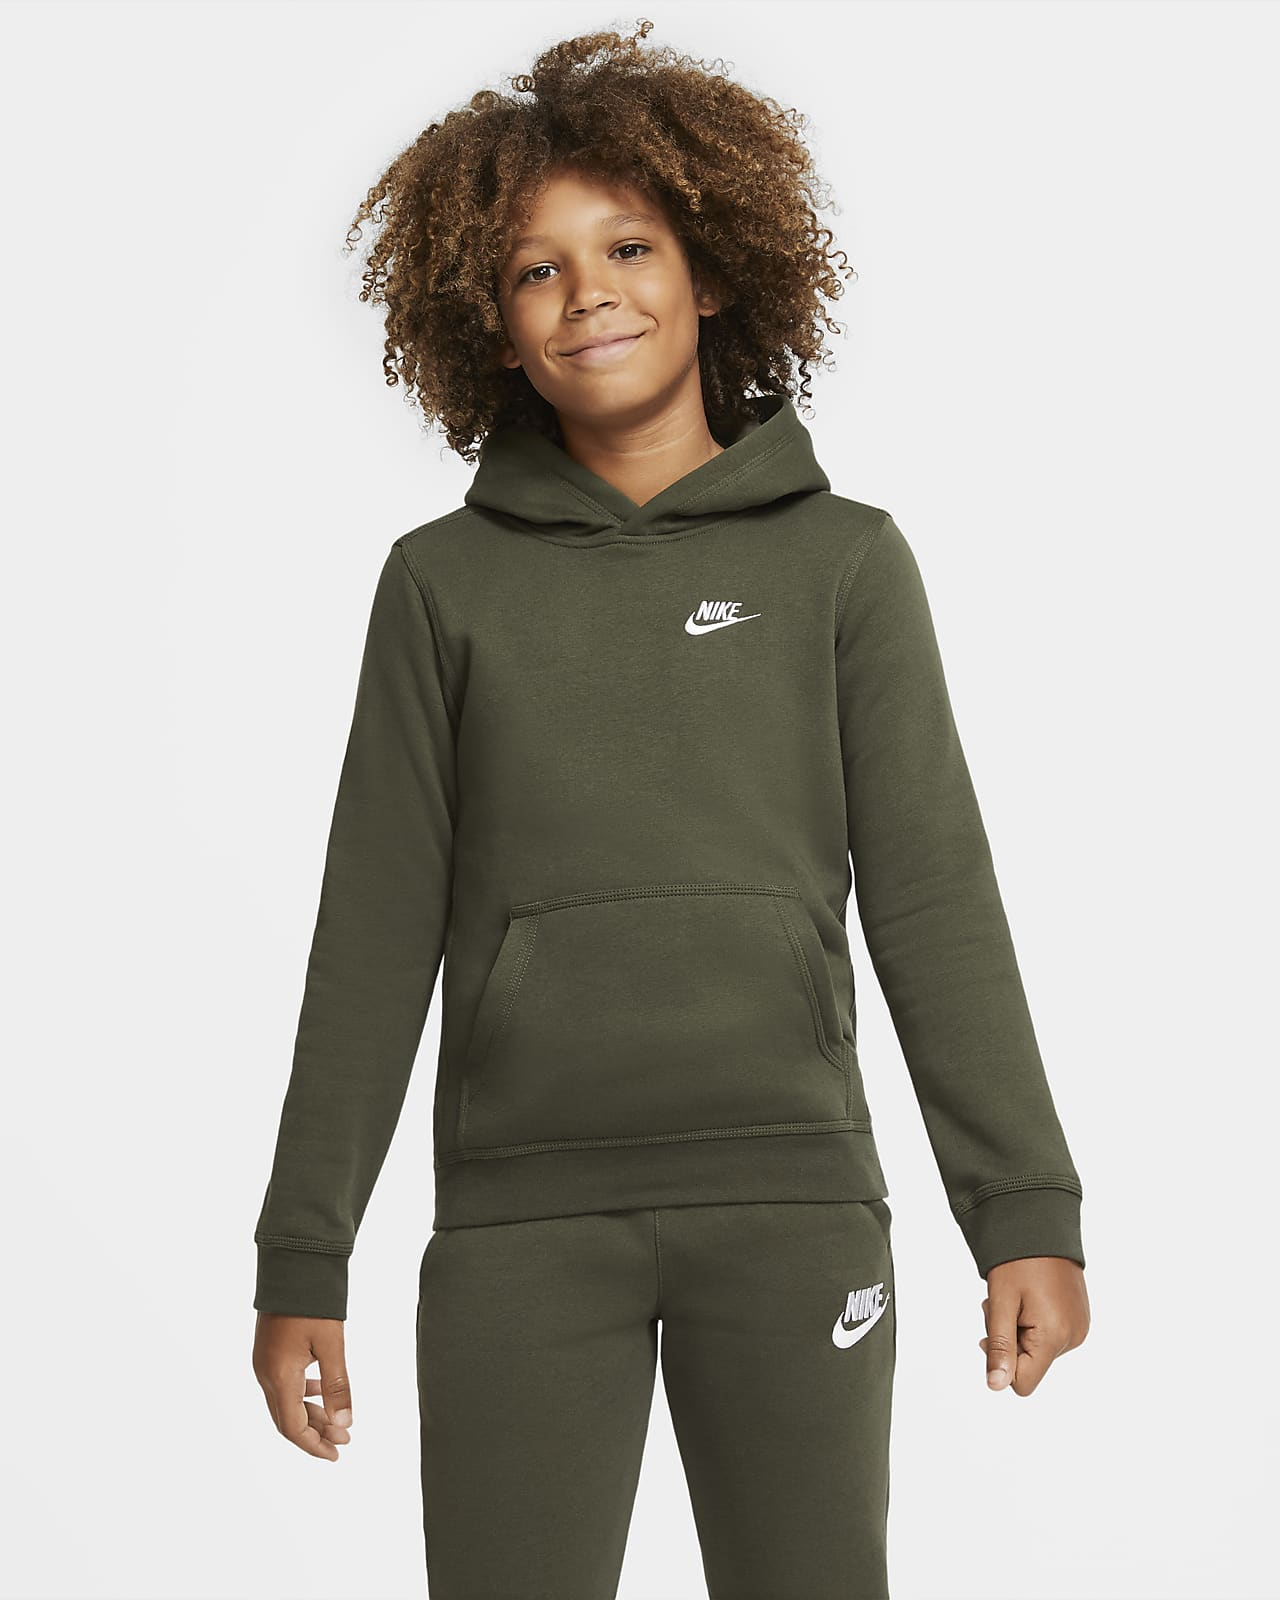 Sudadera Con Capucha Sin Cierre Para Nino Talla Grande Nike Sportswear Club Nike Com